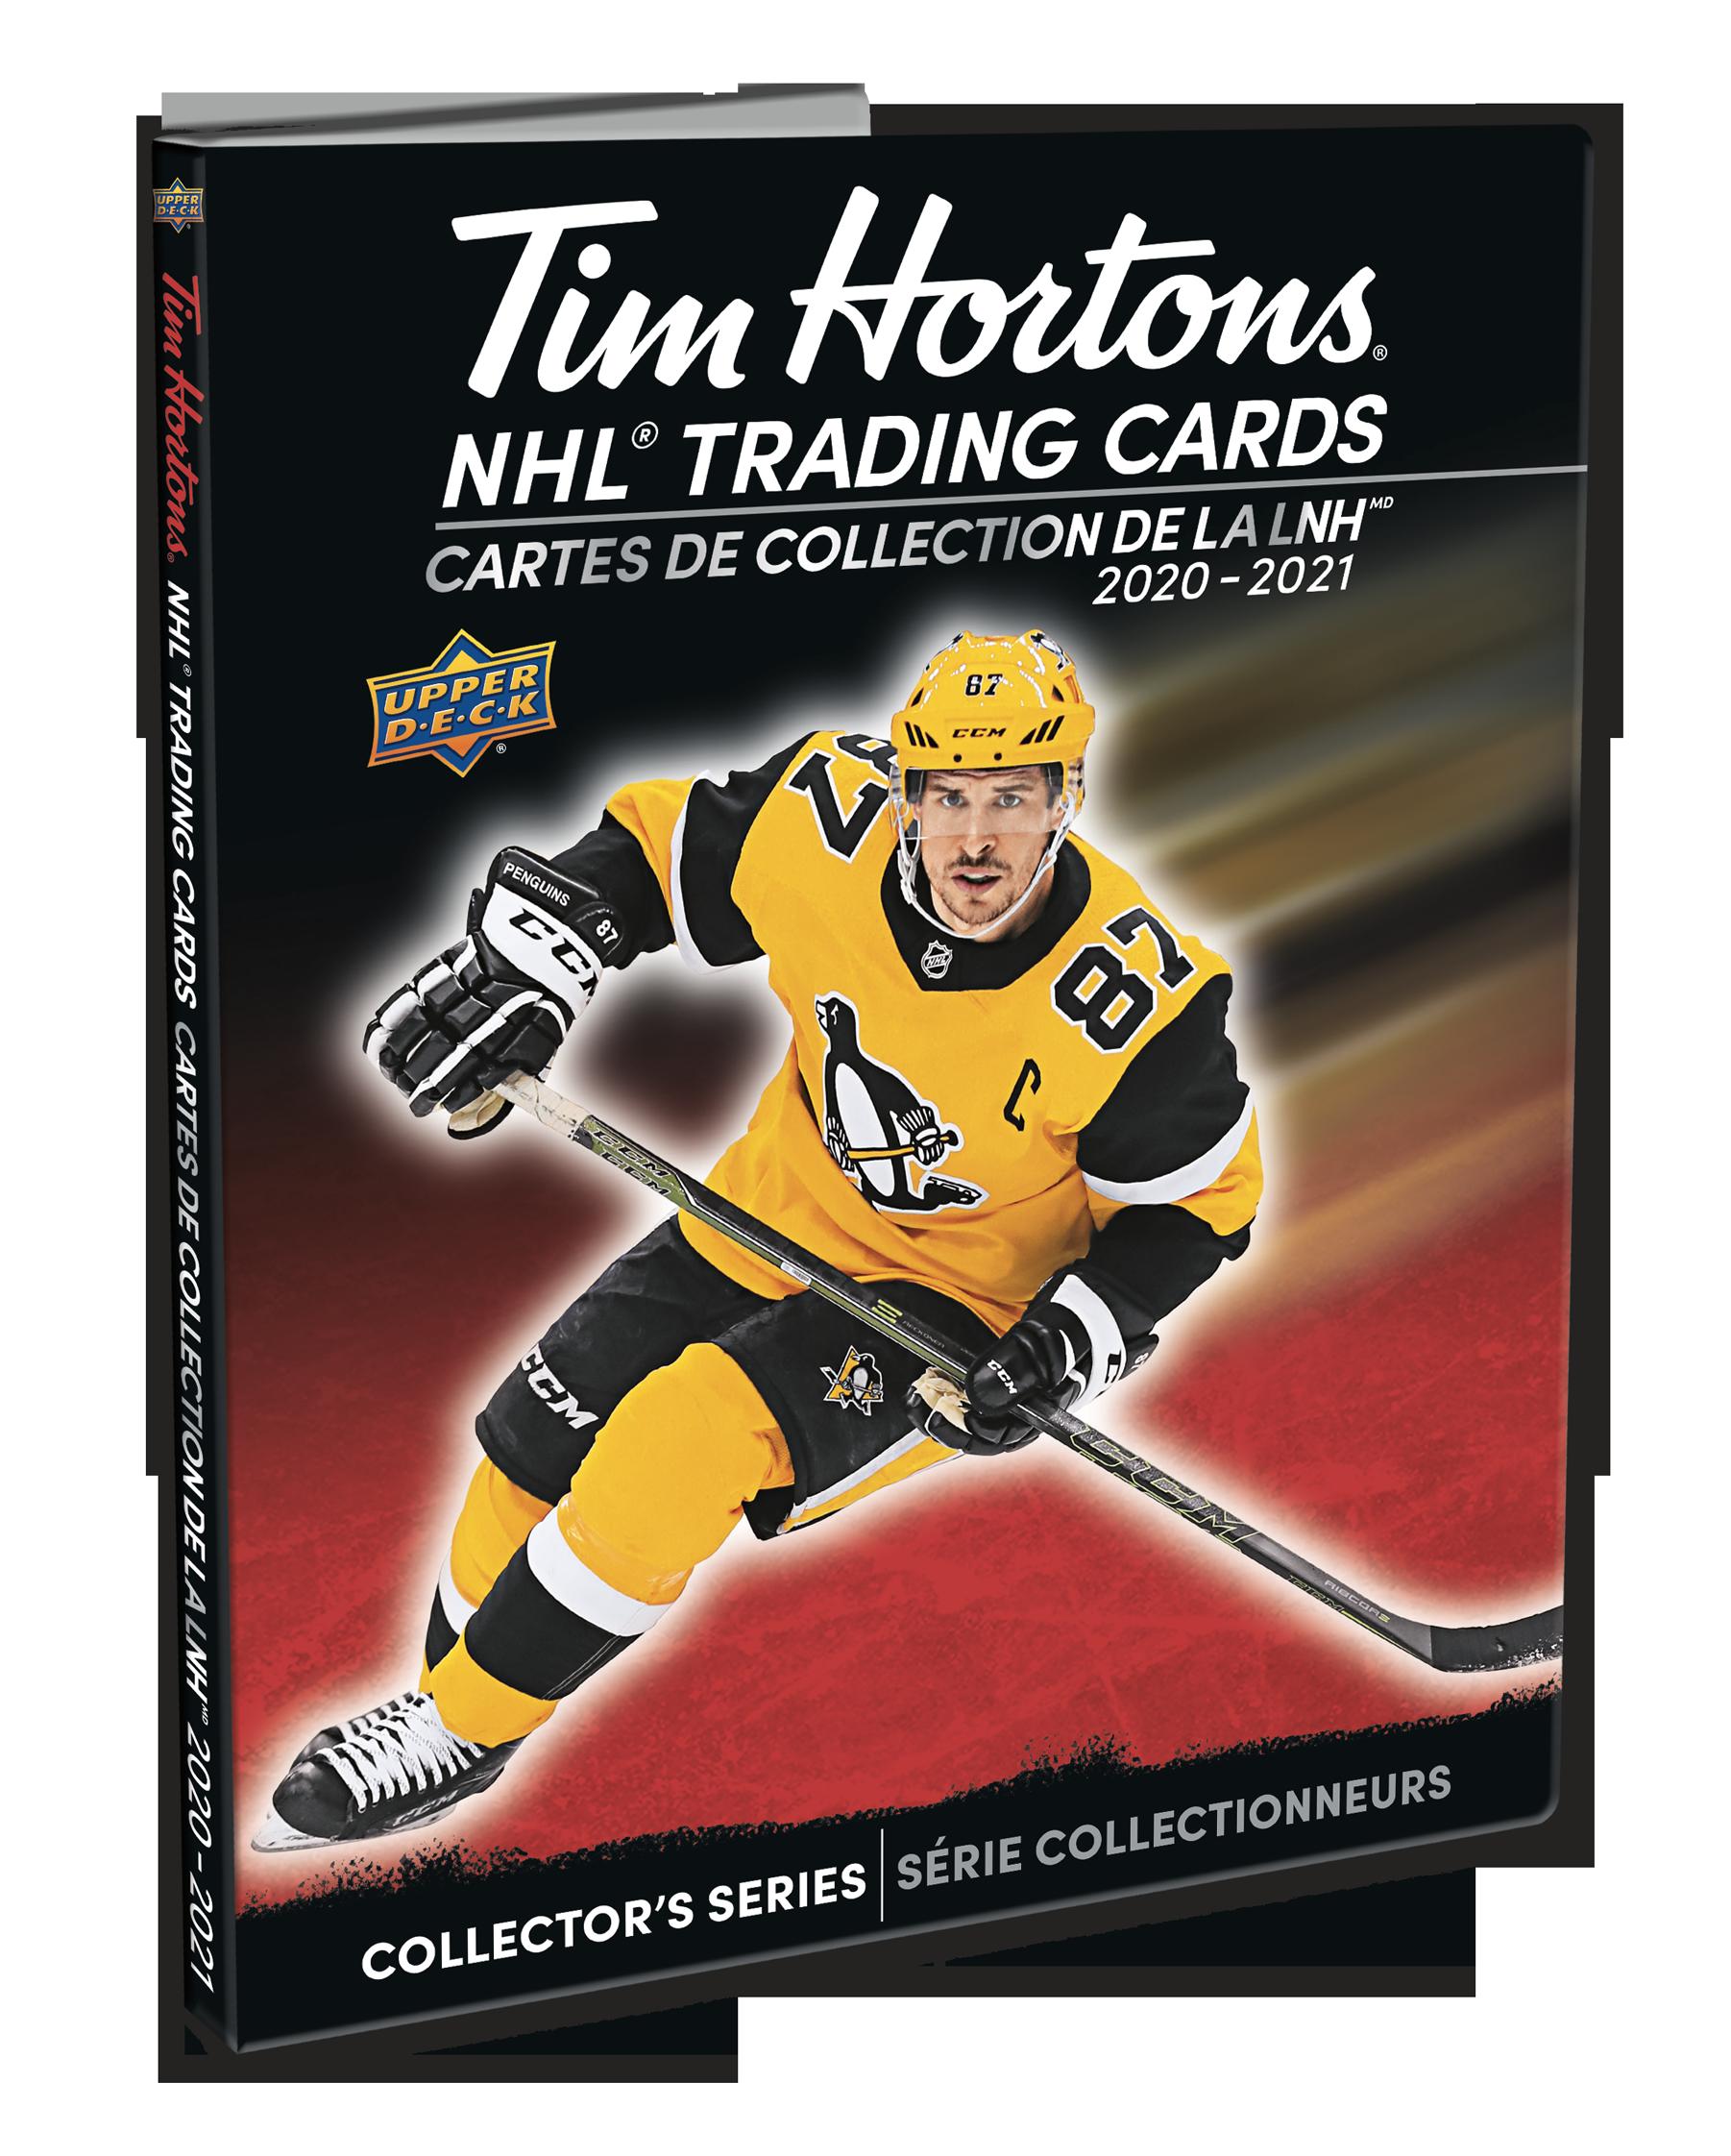 2020-21 Tim Hortons Hockey Binder Sidney Crosby